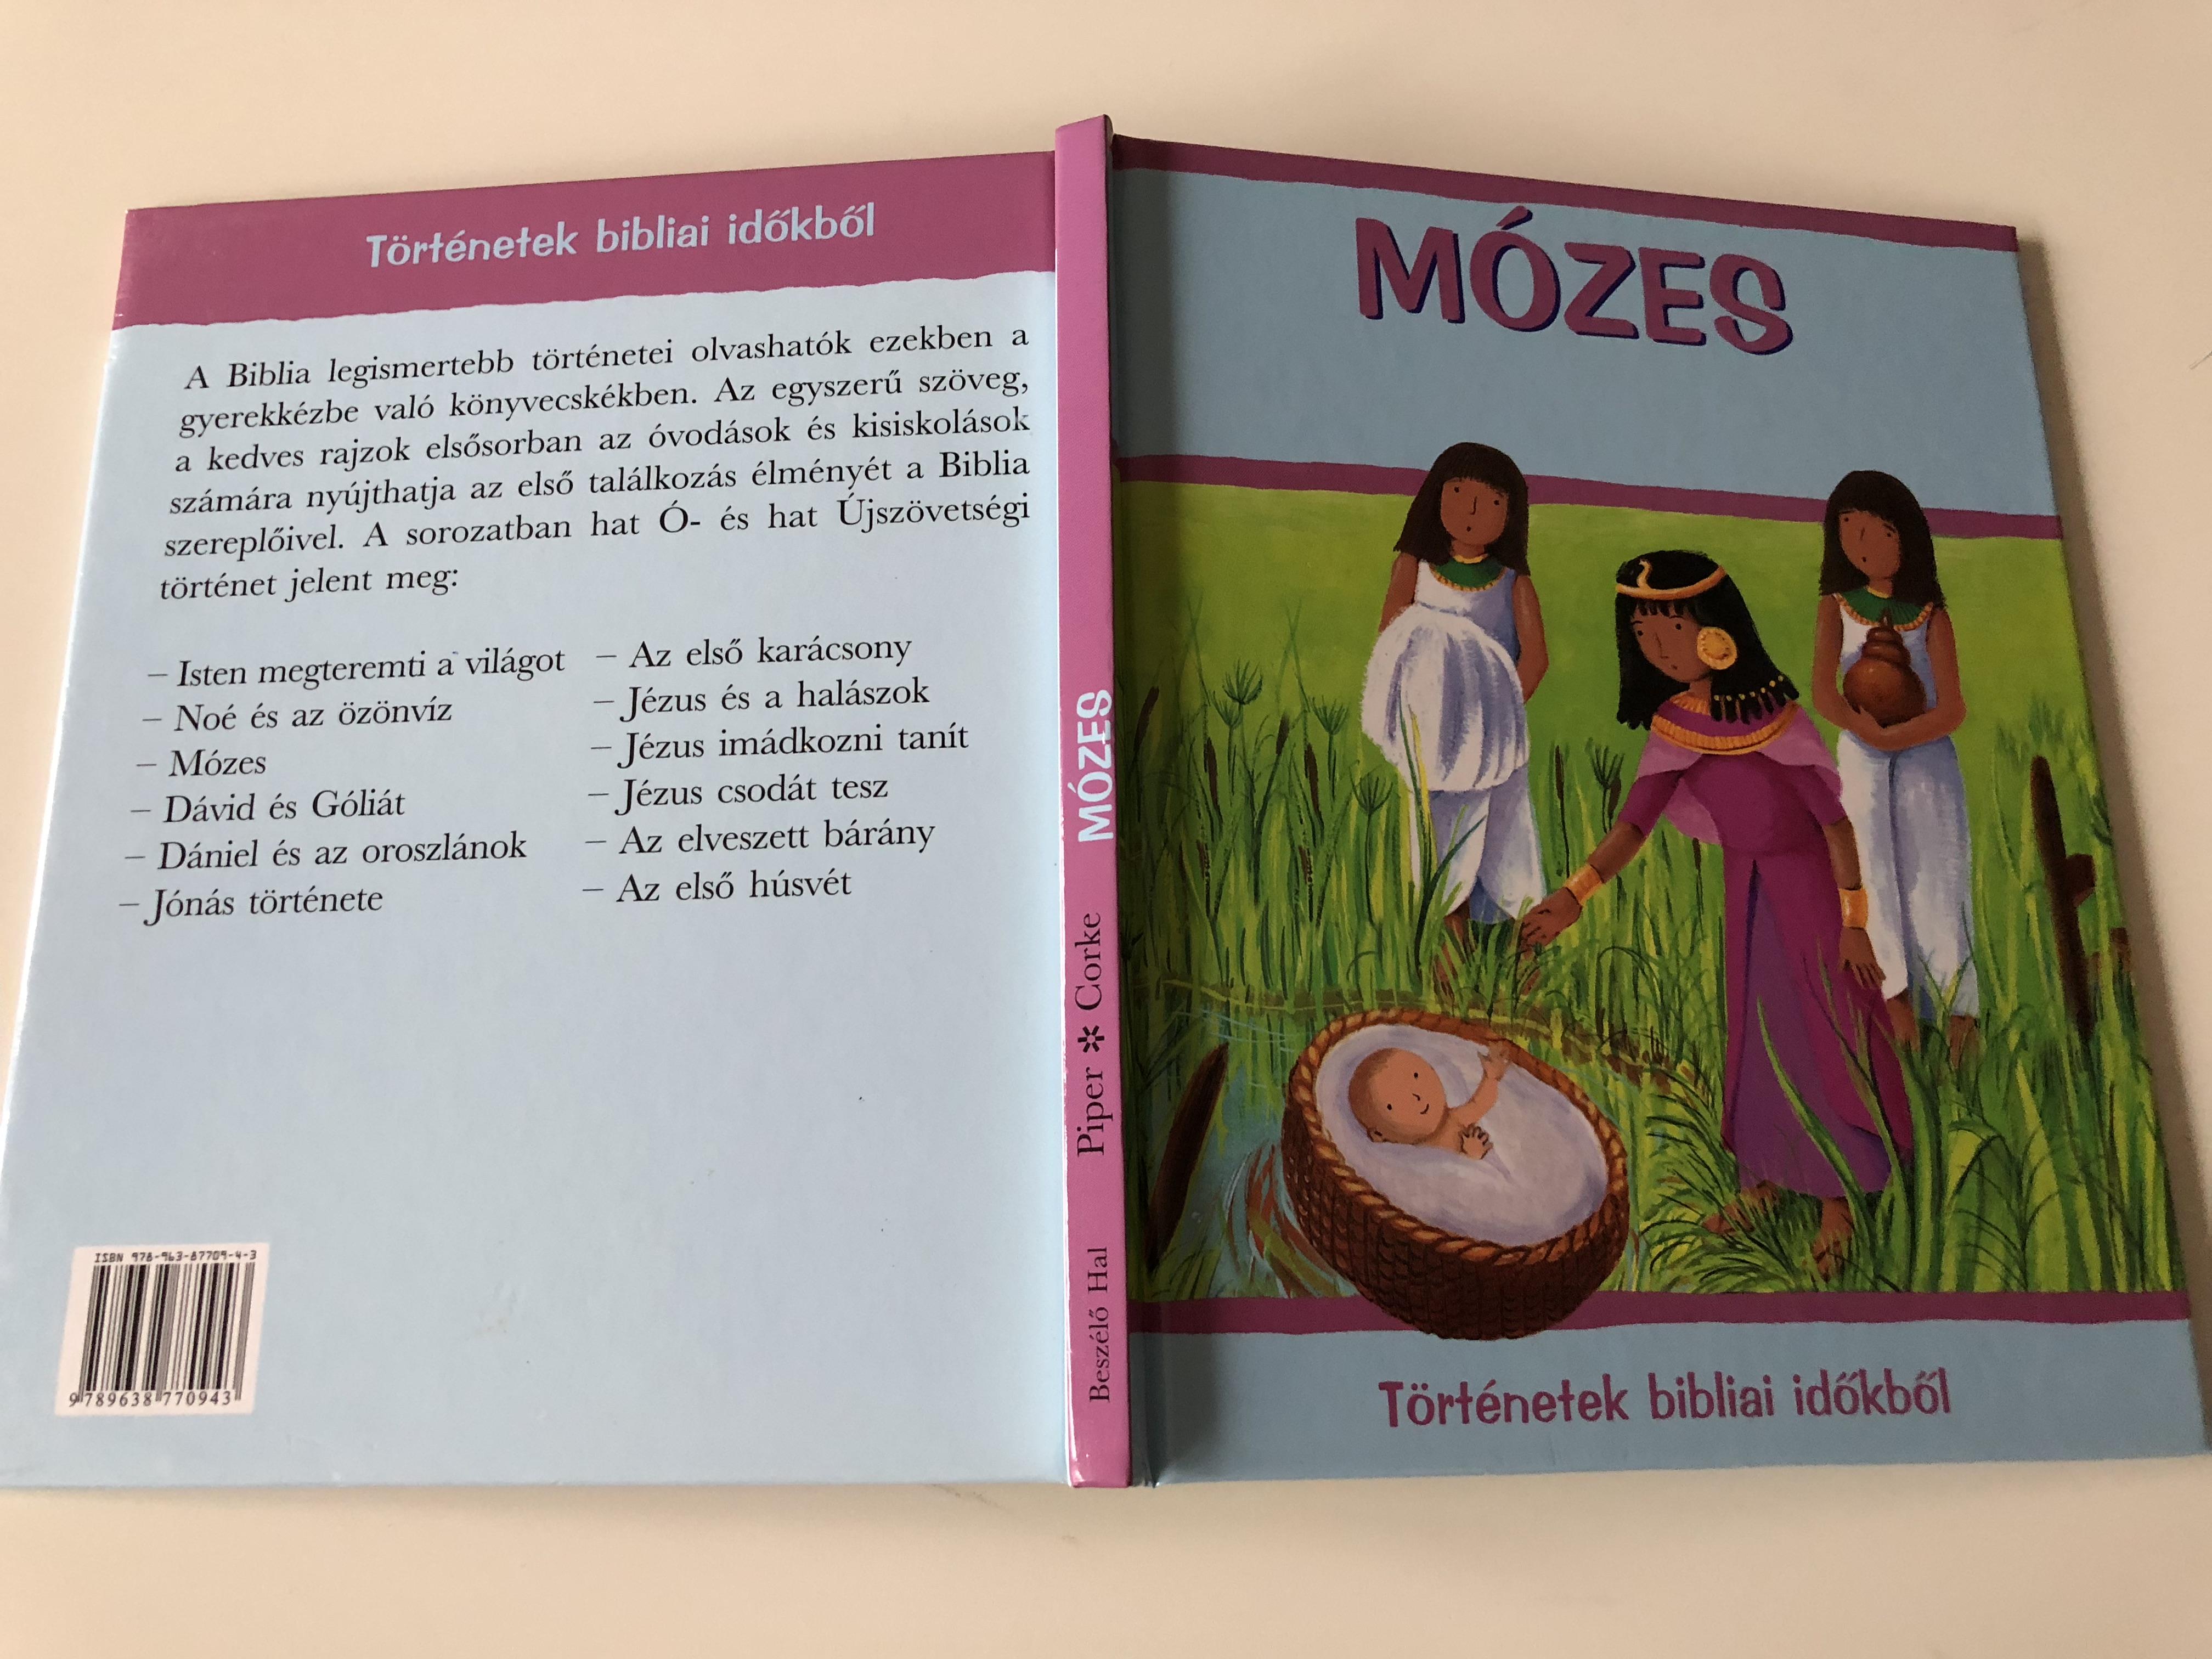 m-zes-moses-and-the-princess-in-hungarian-language-lion-hudson-sophie-piper-estelle-corke-hardcover-t-rt-netek-bibliai-id-kb-l-besz-l-hal-kft-12-.jpg